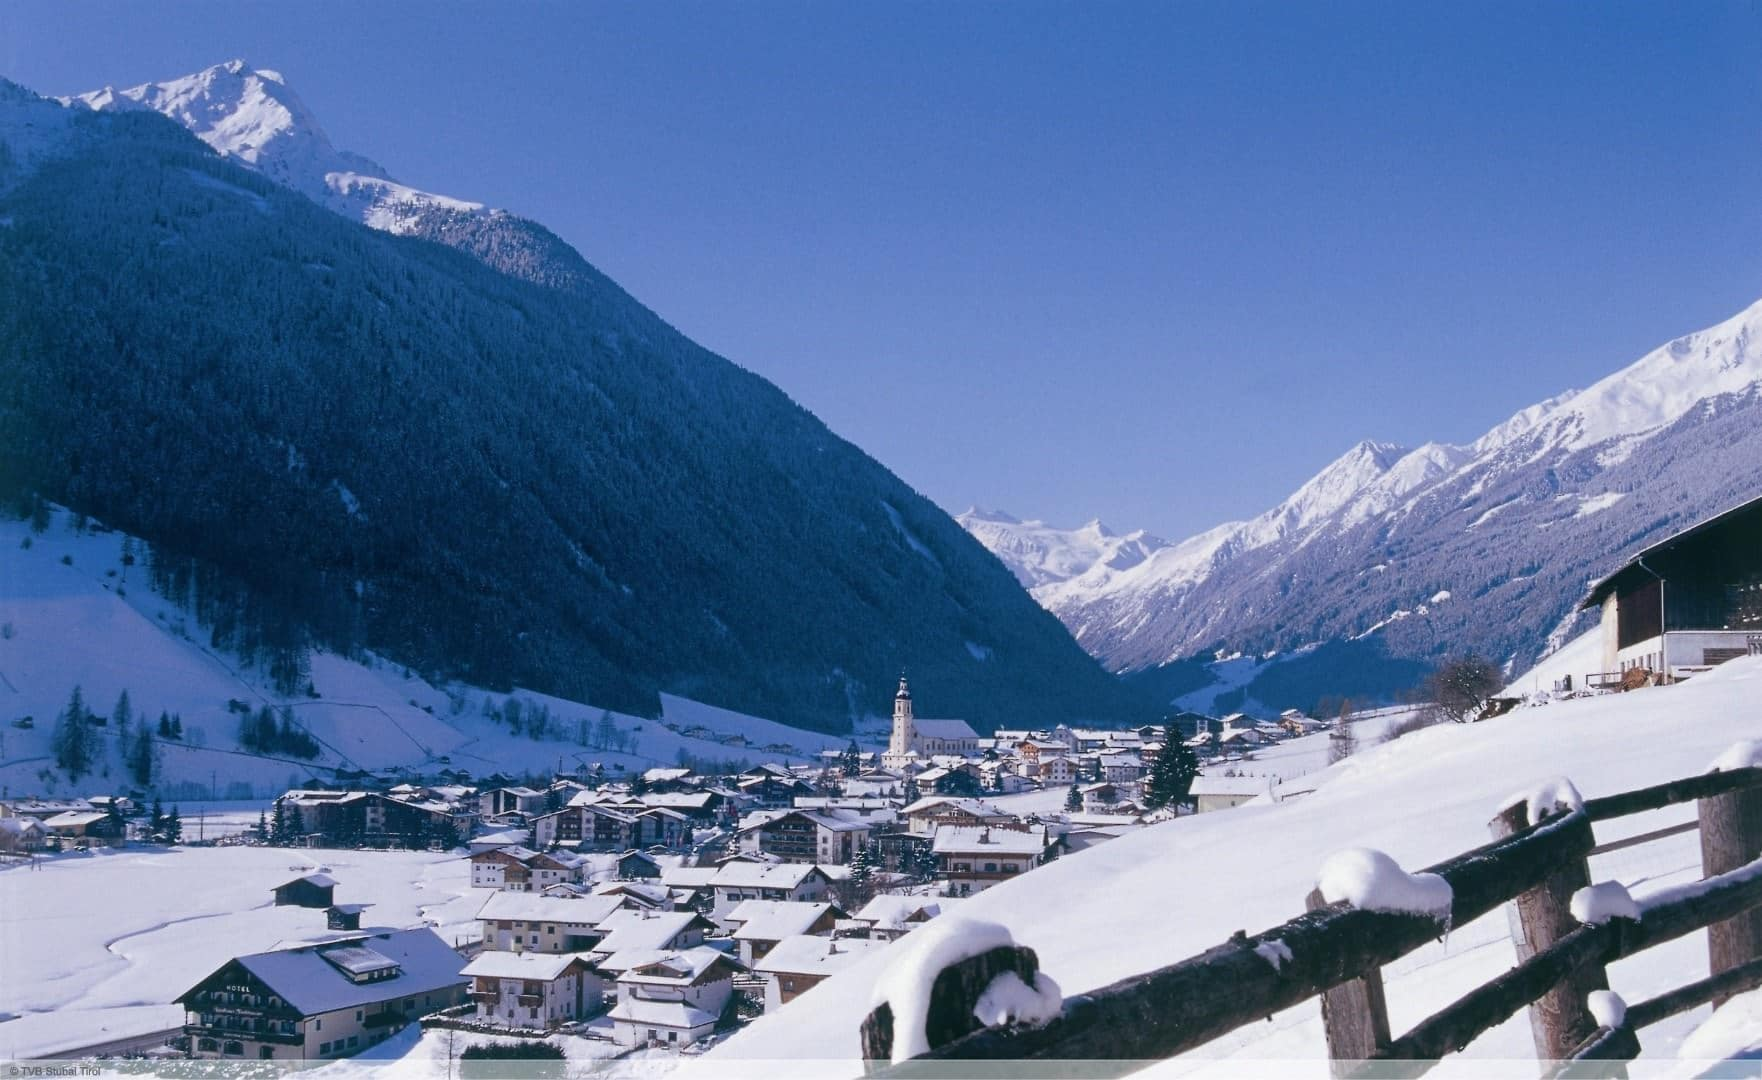 wintersport en aanbiedingen in Neustift